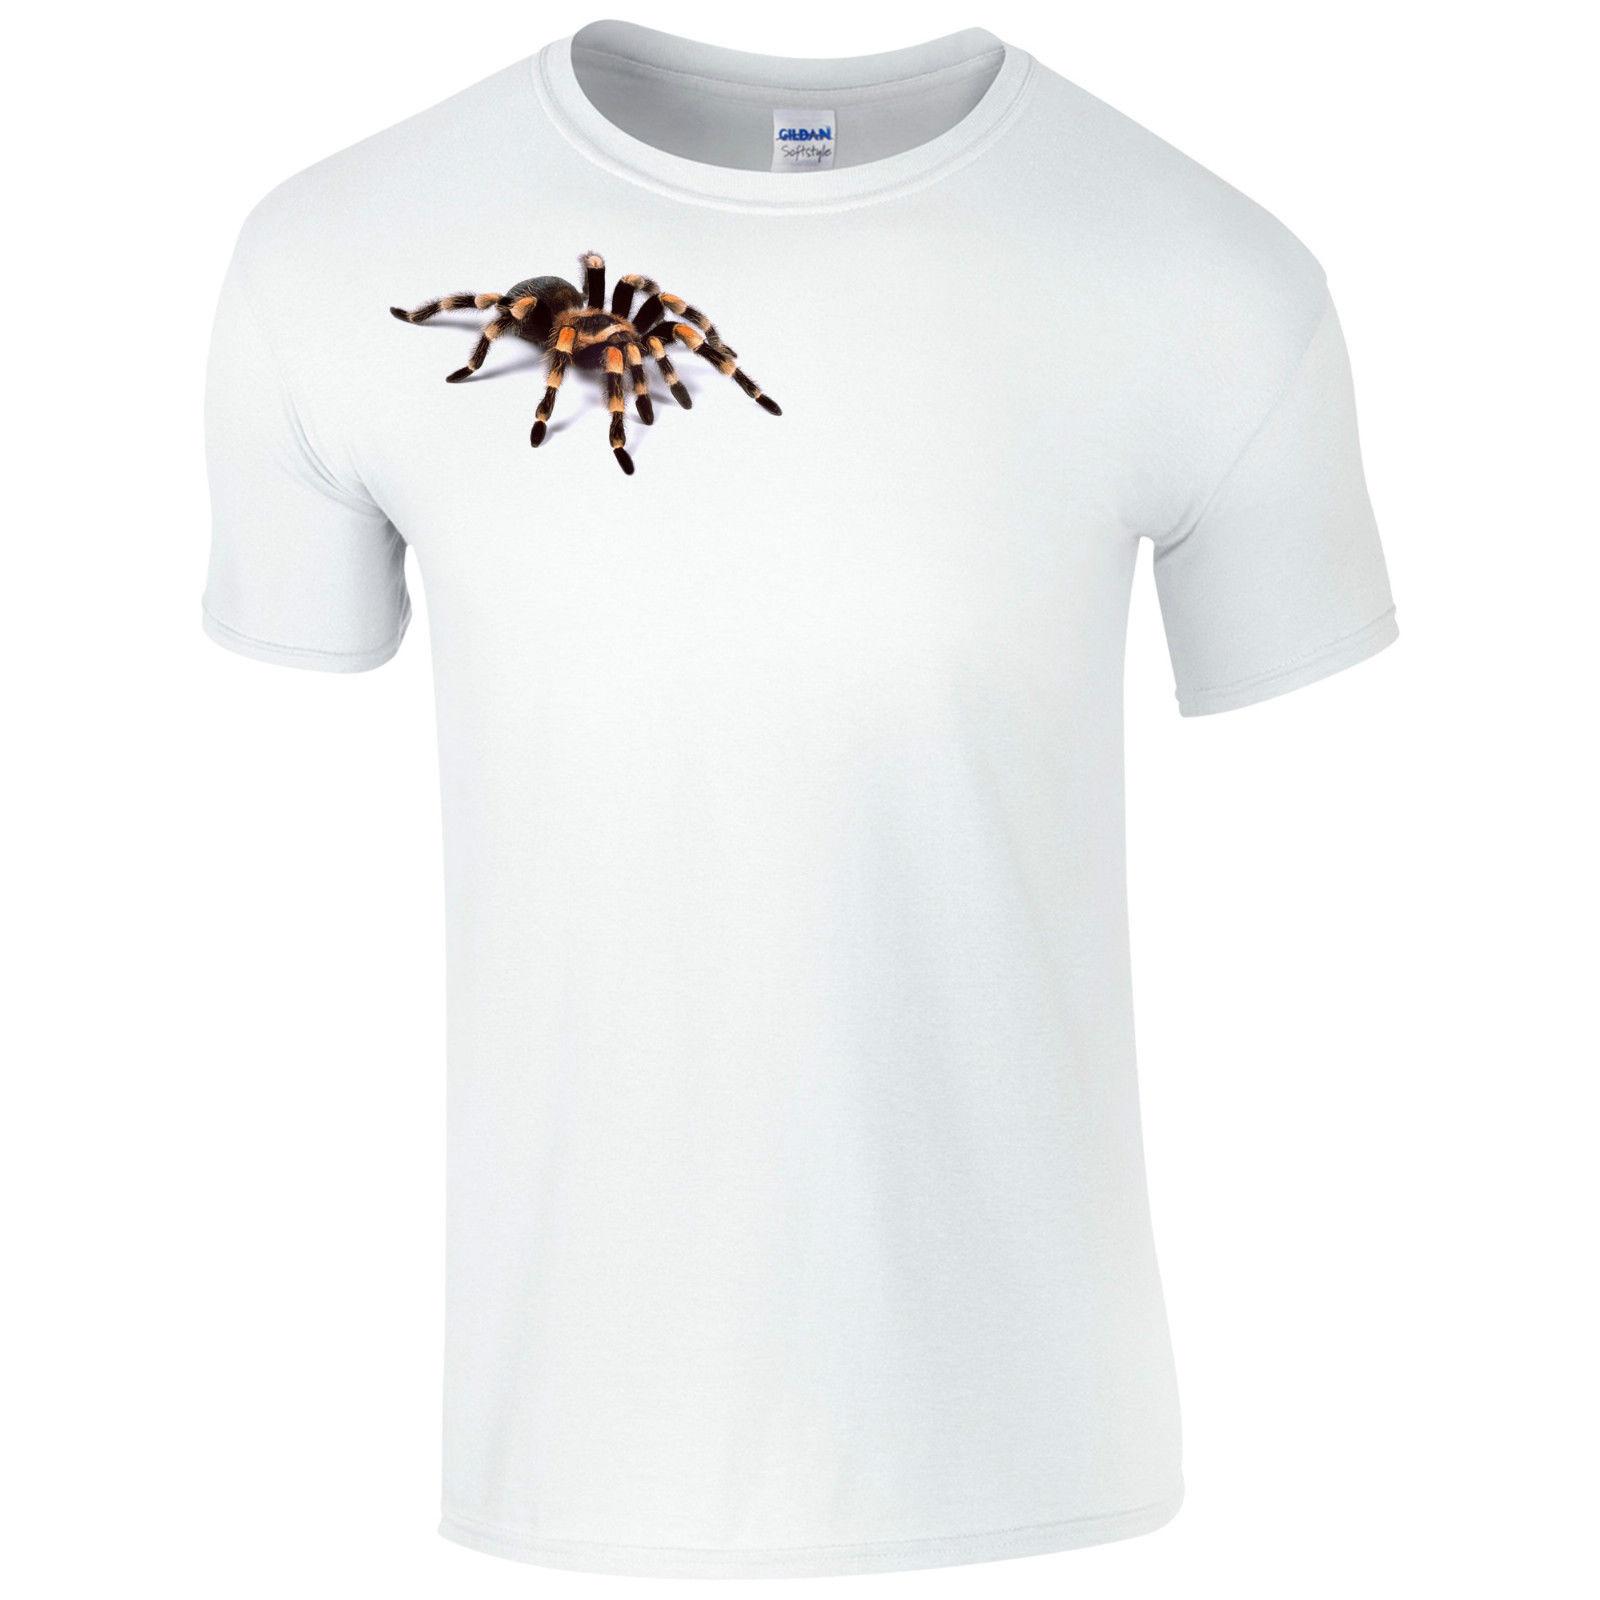 CoöPeratieve Scary Tarantula T-shirt-spooky Spider Joke Halloween 3d Horror Gift Mens Top Cool Casual Trots Tshirt Mannen Unisex Nieuwe Mode Puur Wit En Doorschijnend